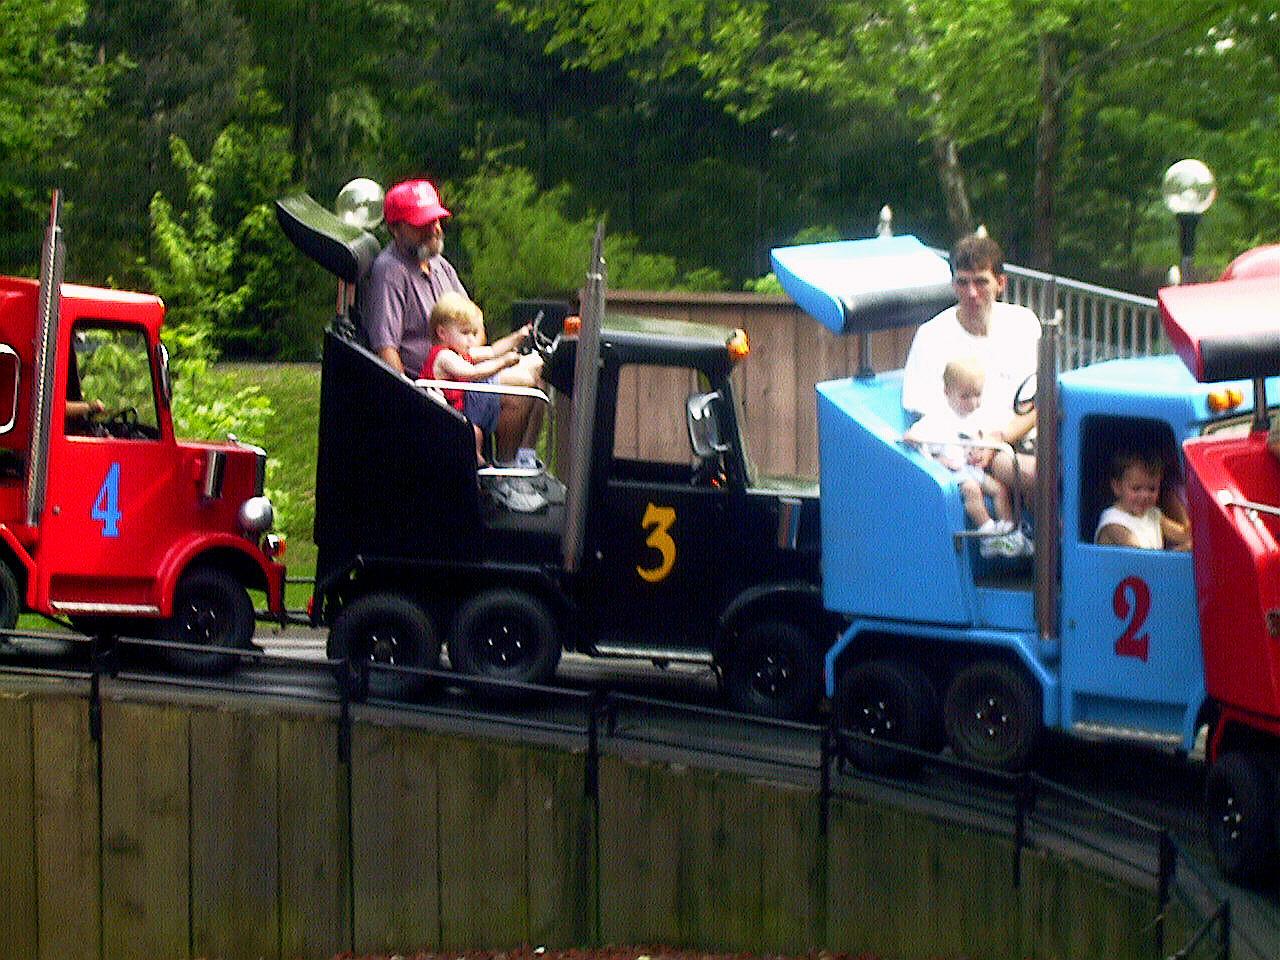 Convoy Ride at Dollywood